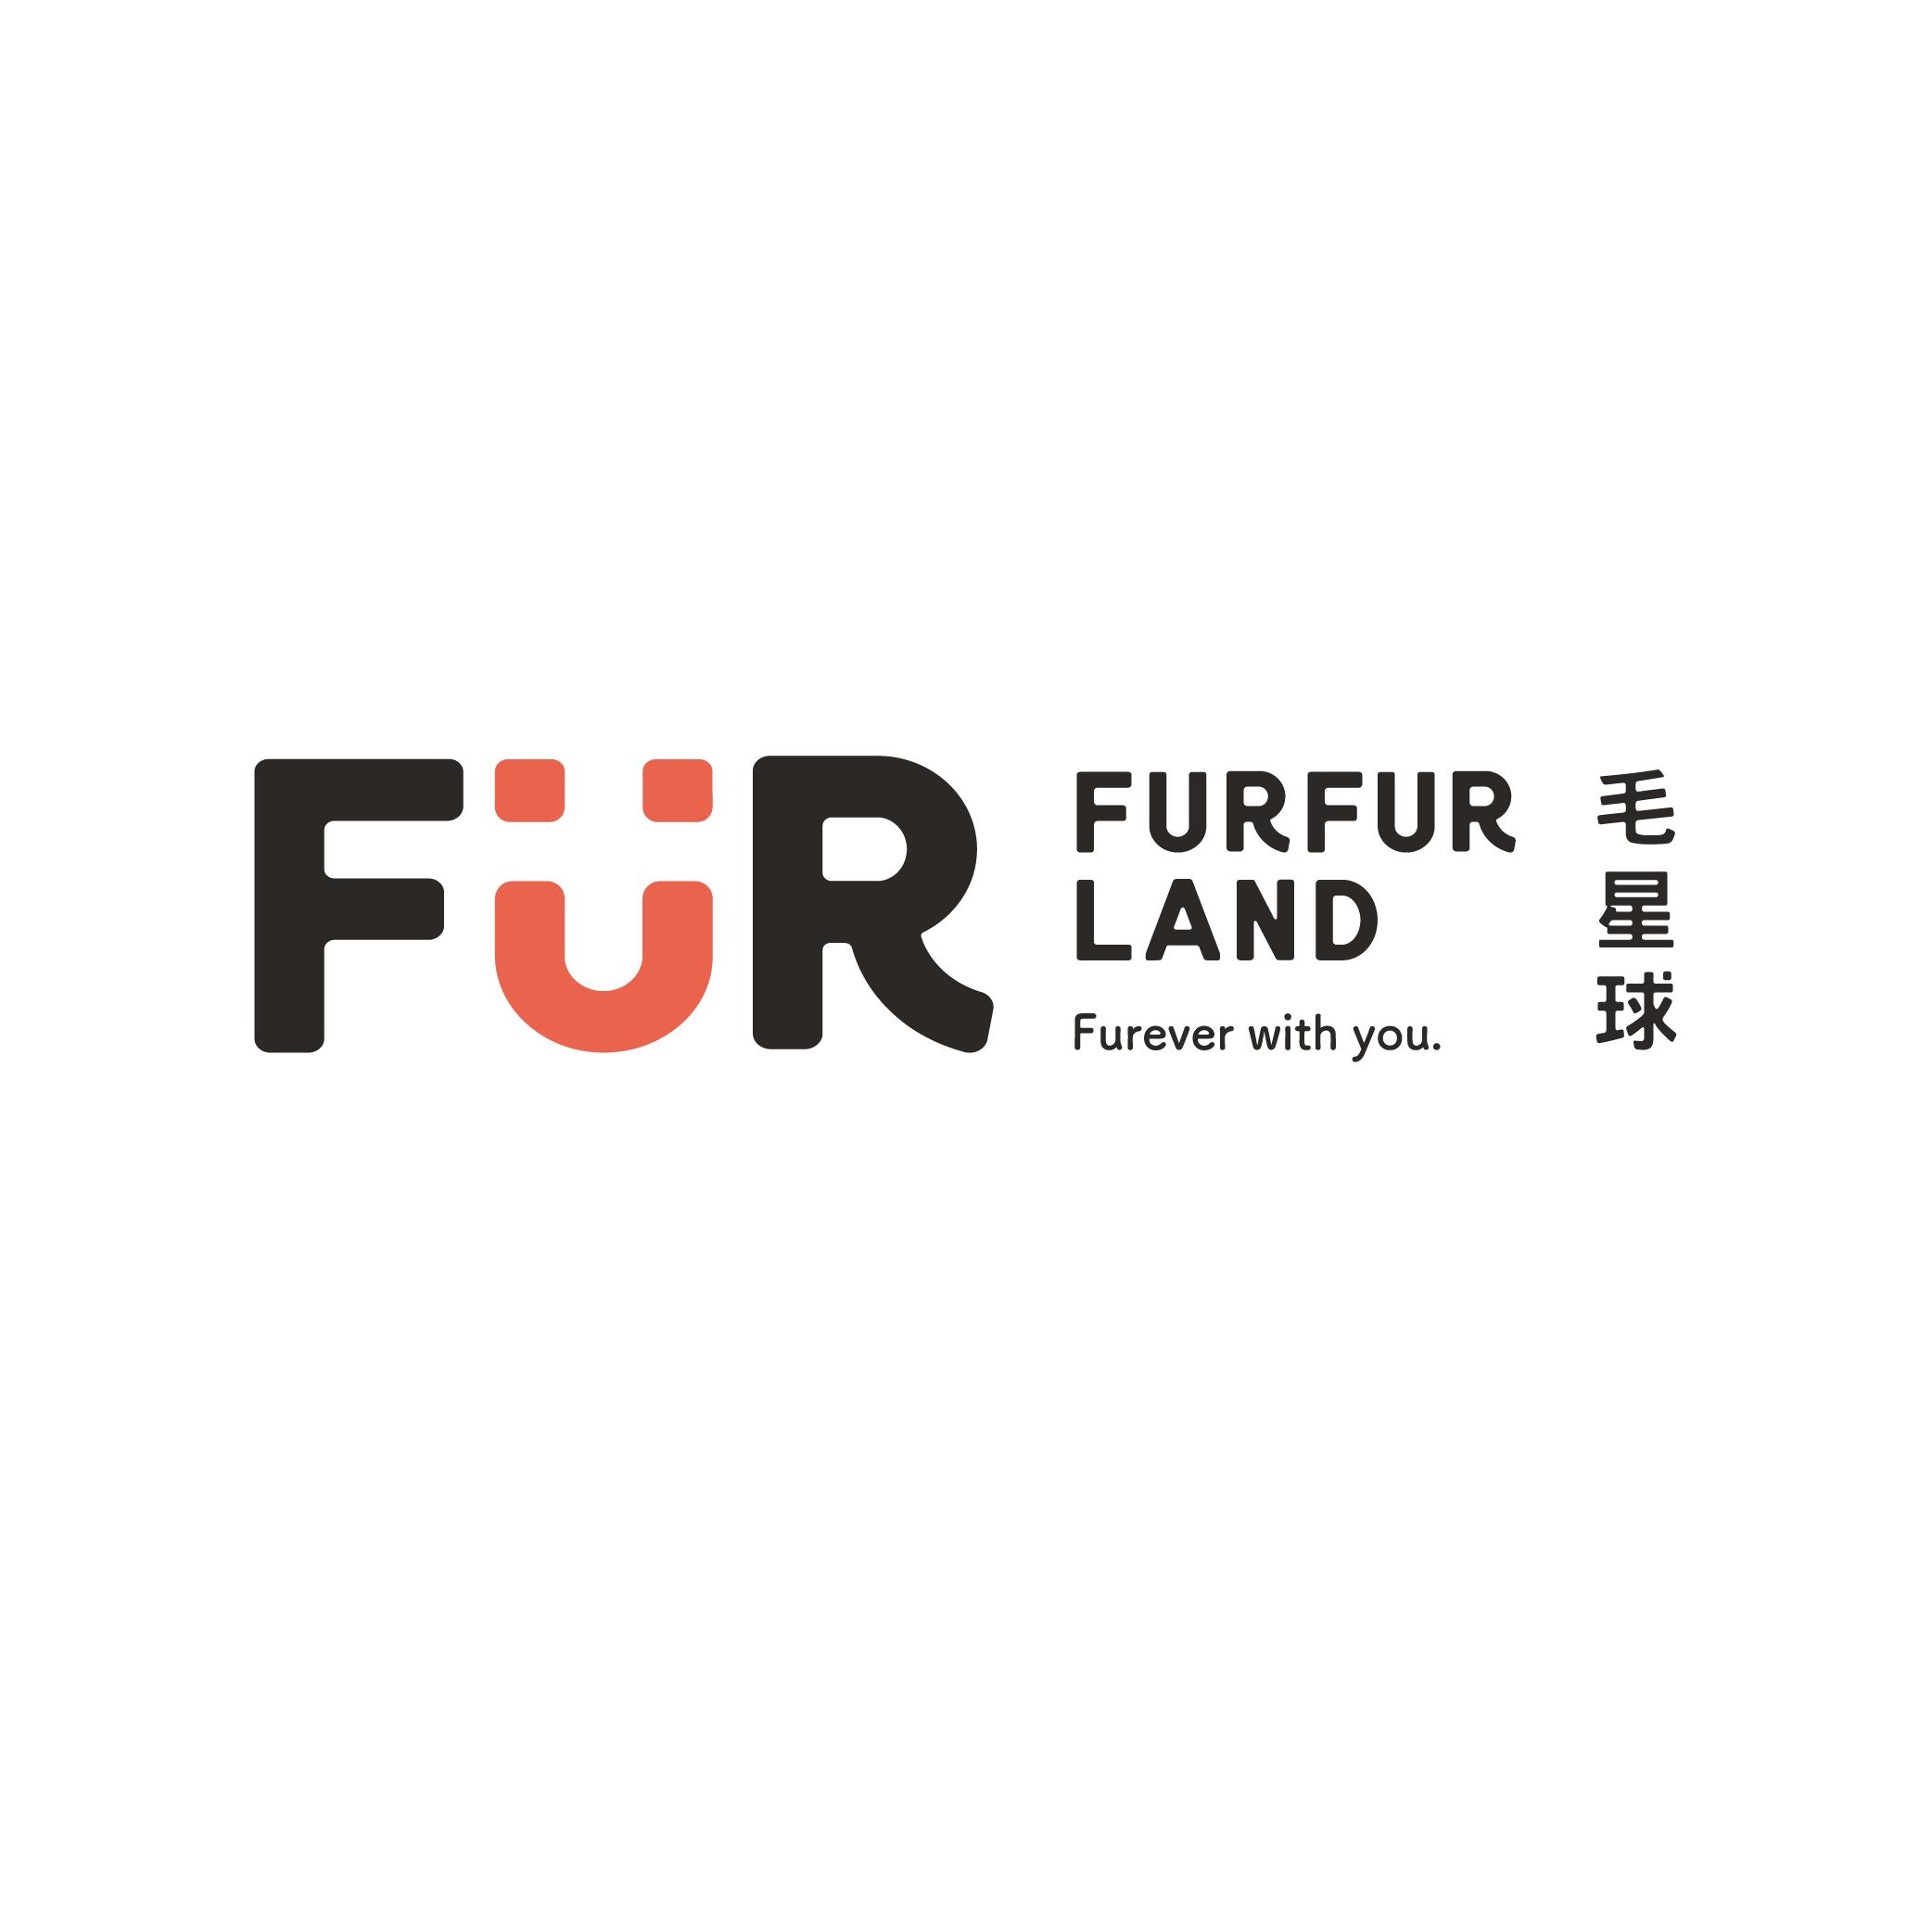 毛星球FurFur Land